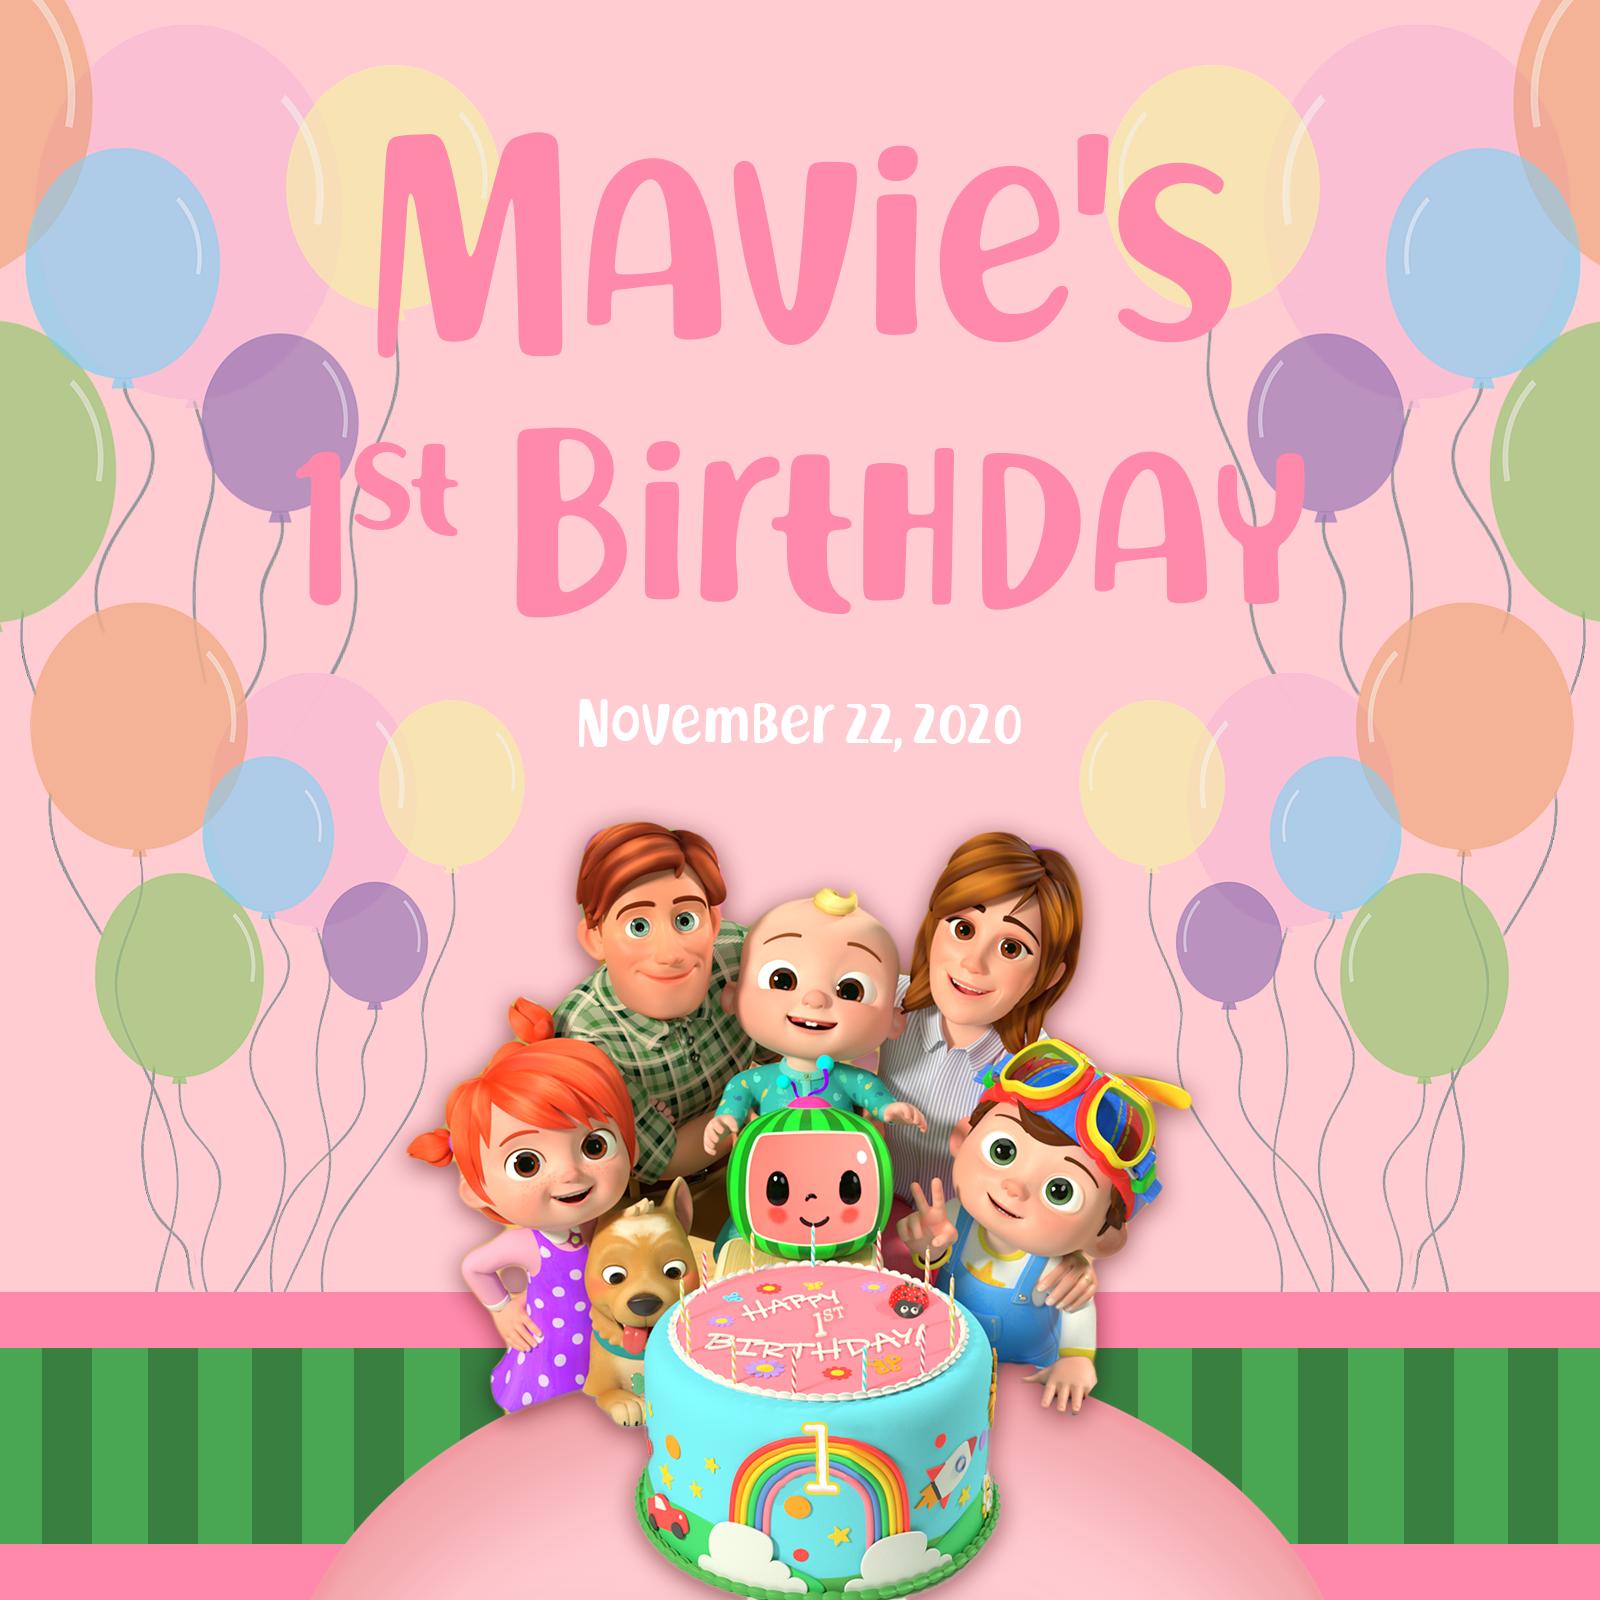 mavie01_splash-rev3